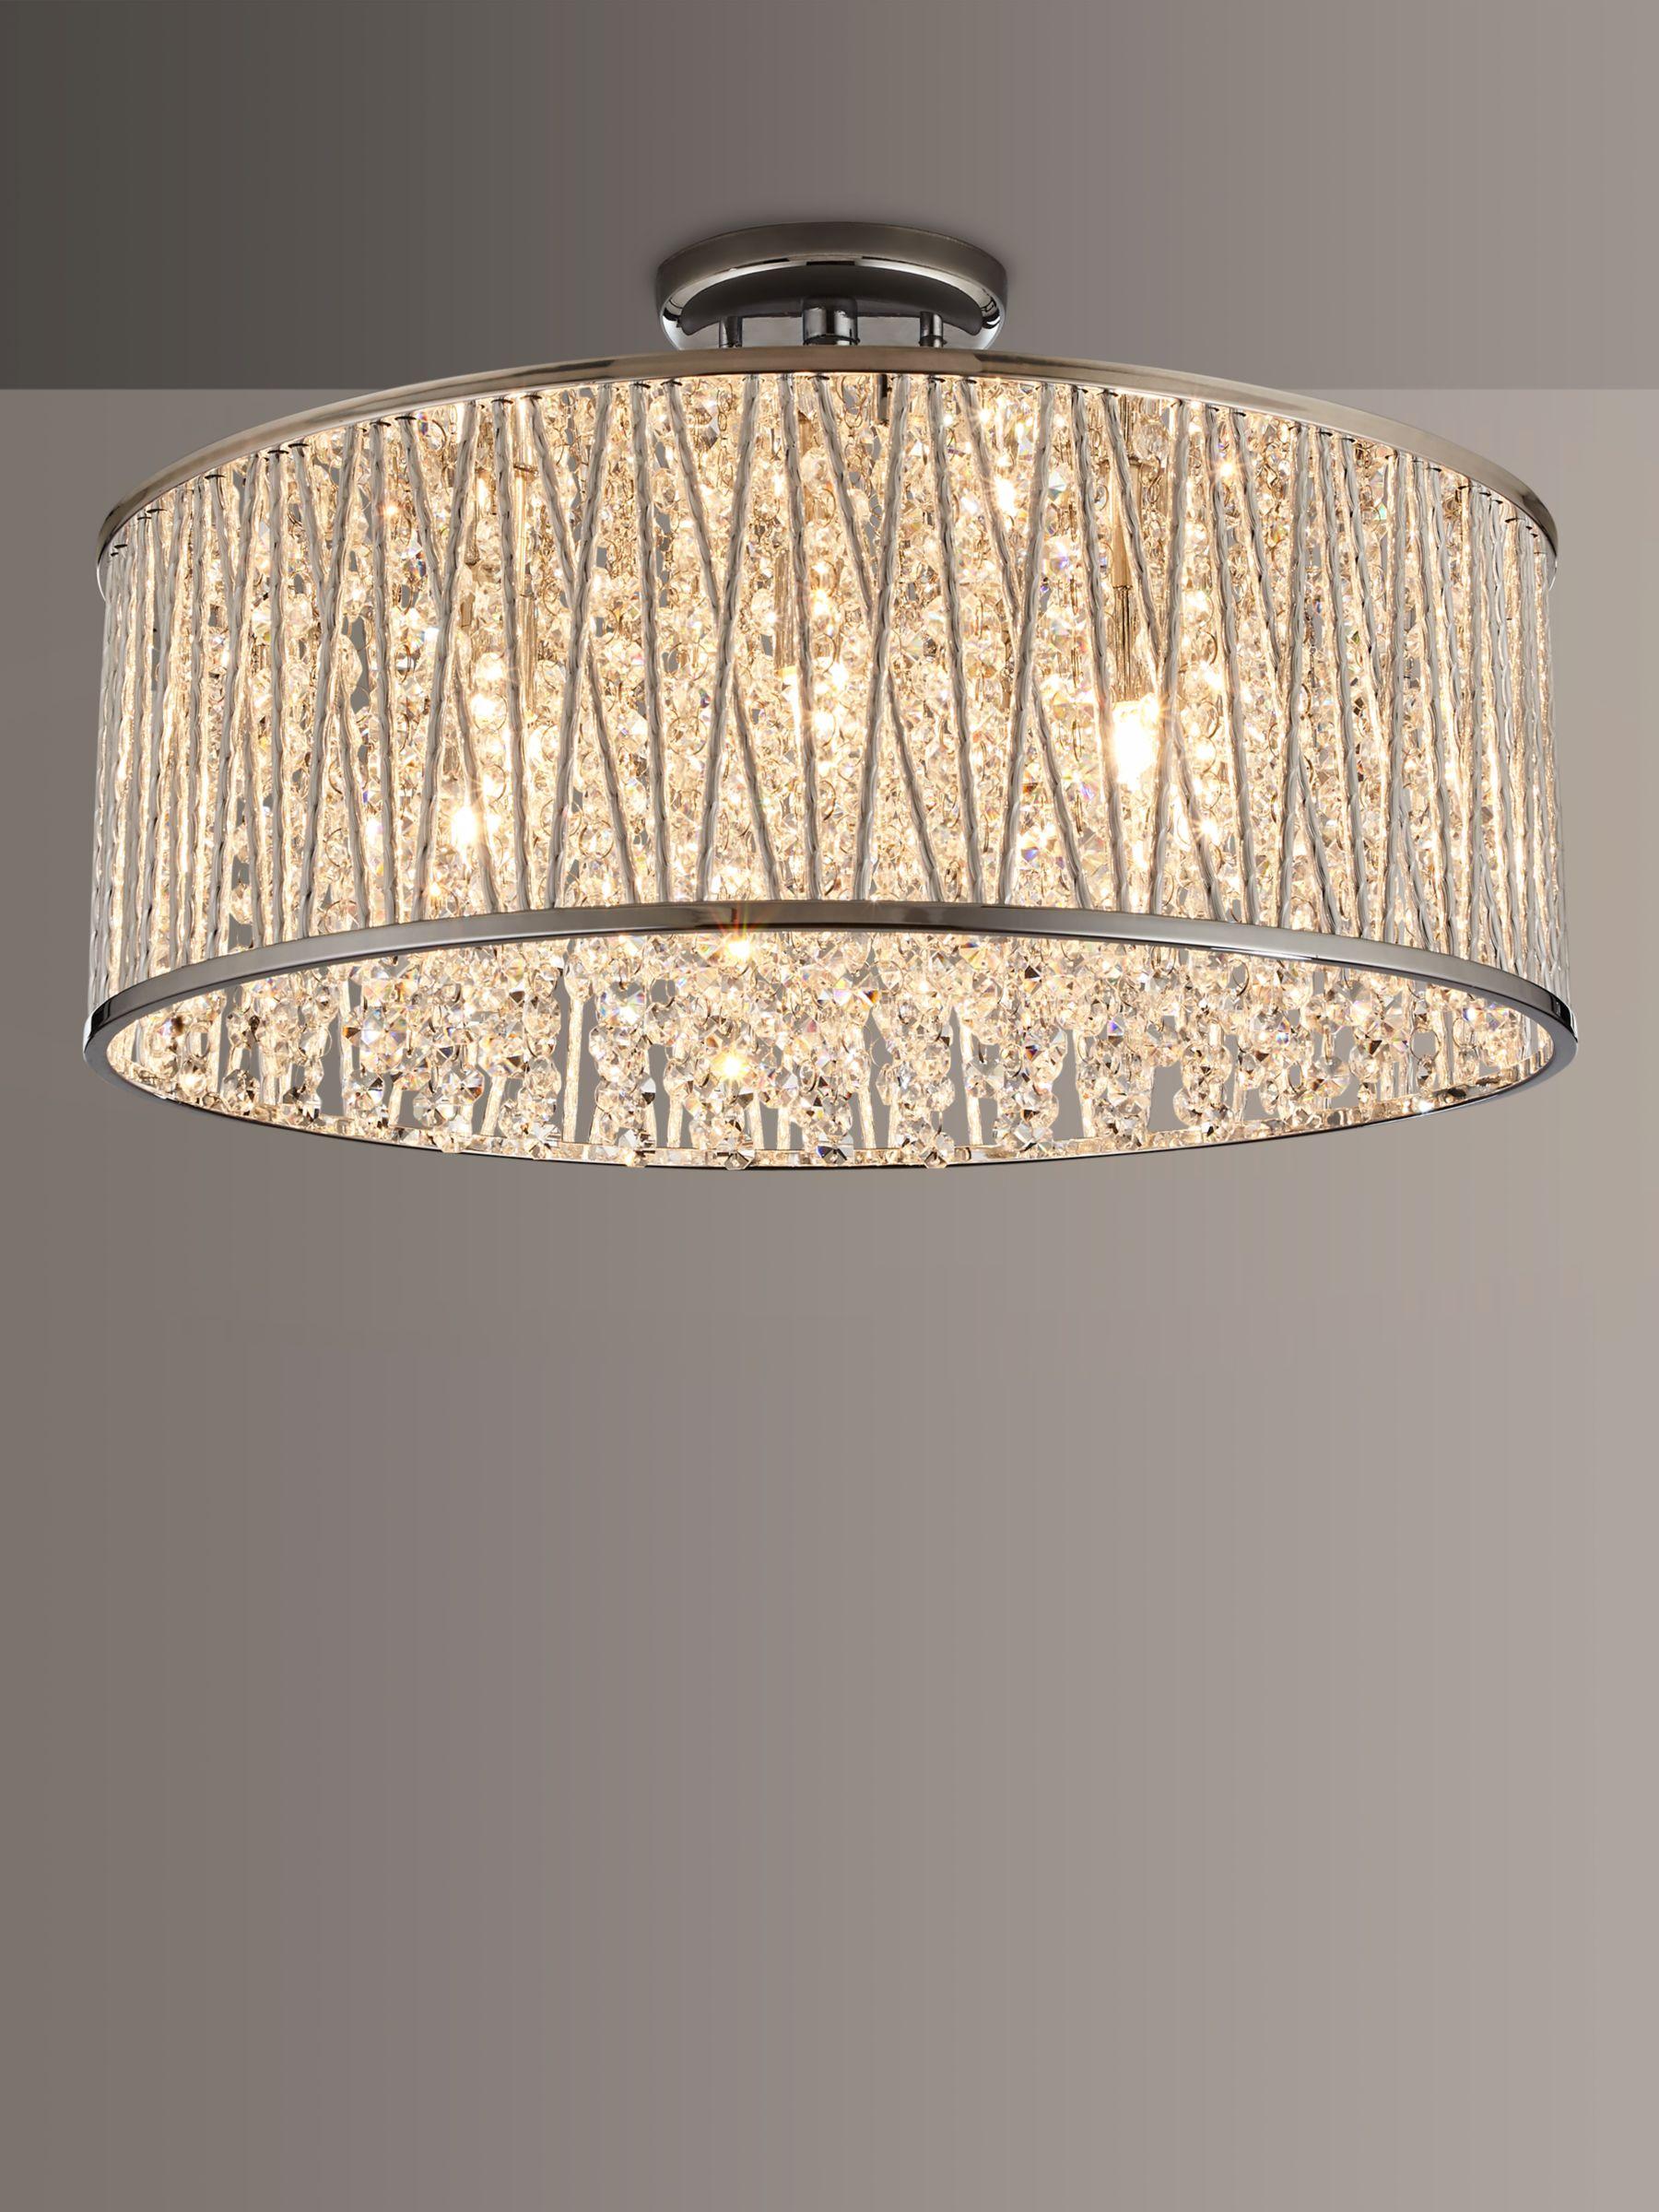 John Lewis Partners Emilia Large Crystal Drum Flush Ceiling Light At John Lewis Partners